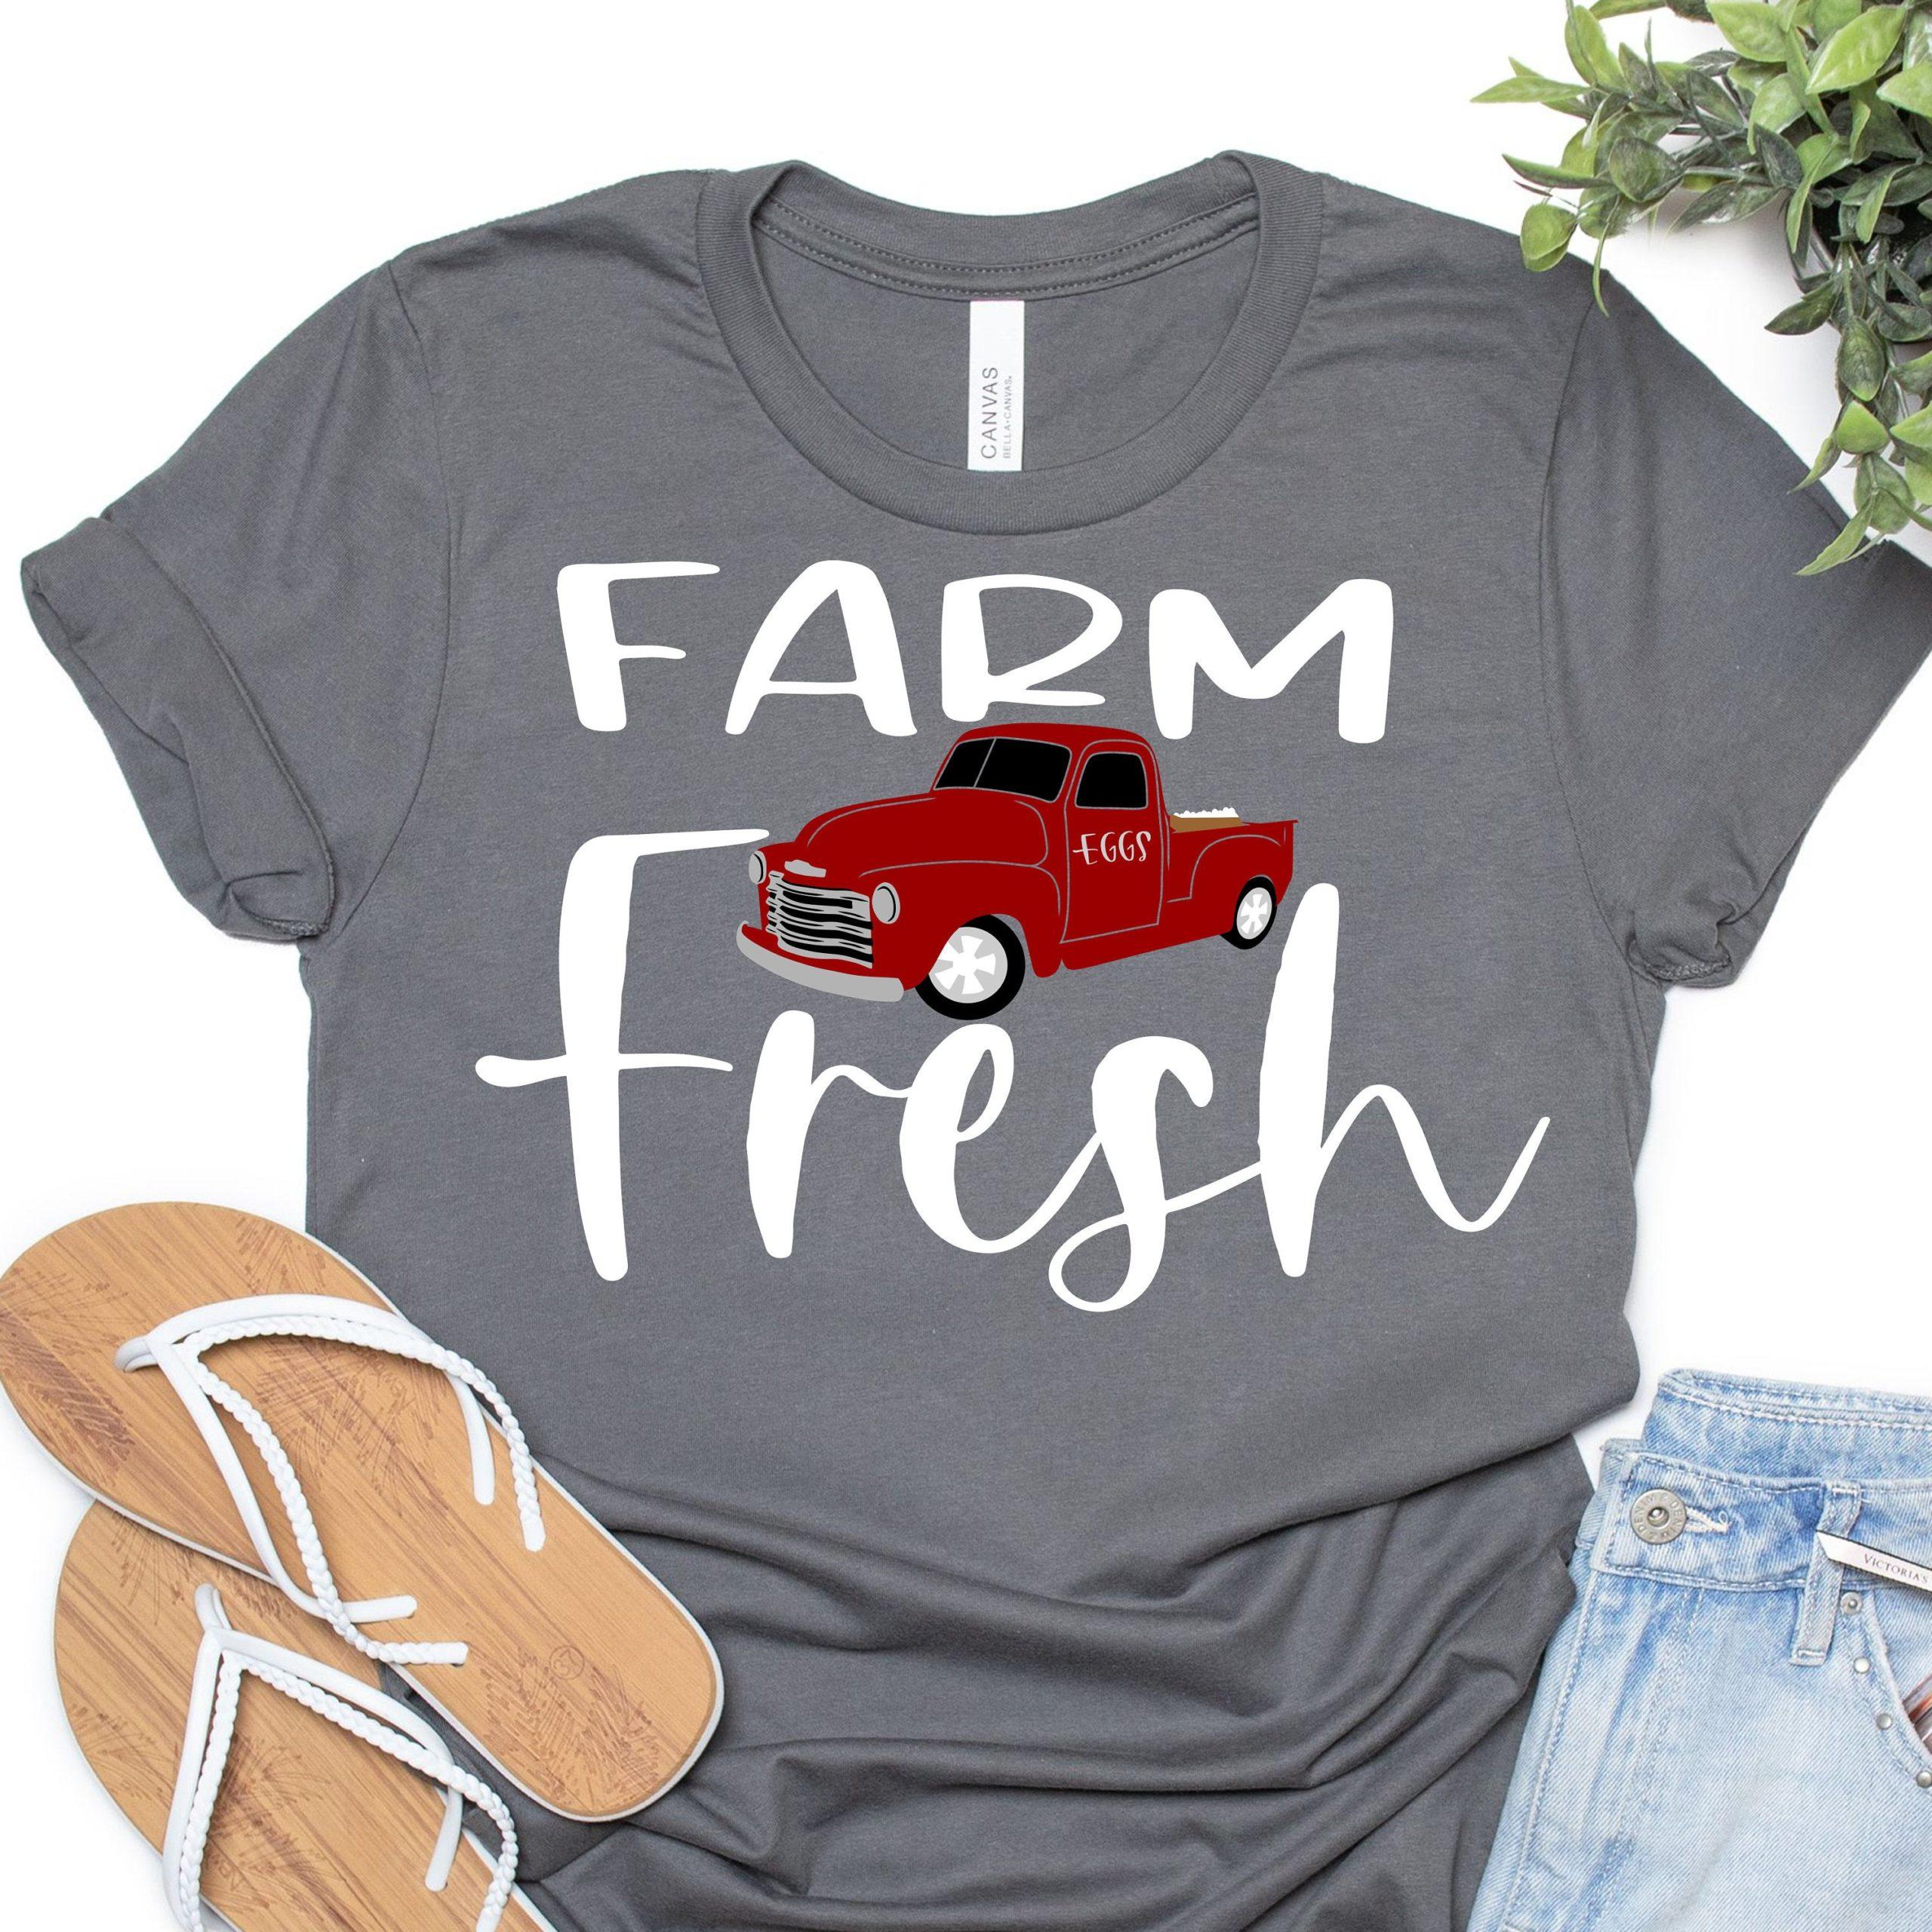 Spring-svg-farm-fresh-eggs-svg-vintage-truck-svg-farm-truck-svg-farm-fresh-eggs-svg-spring-svg-design-spring-cut-file-spring-cricut-60513b1c